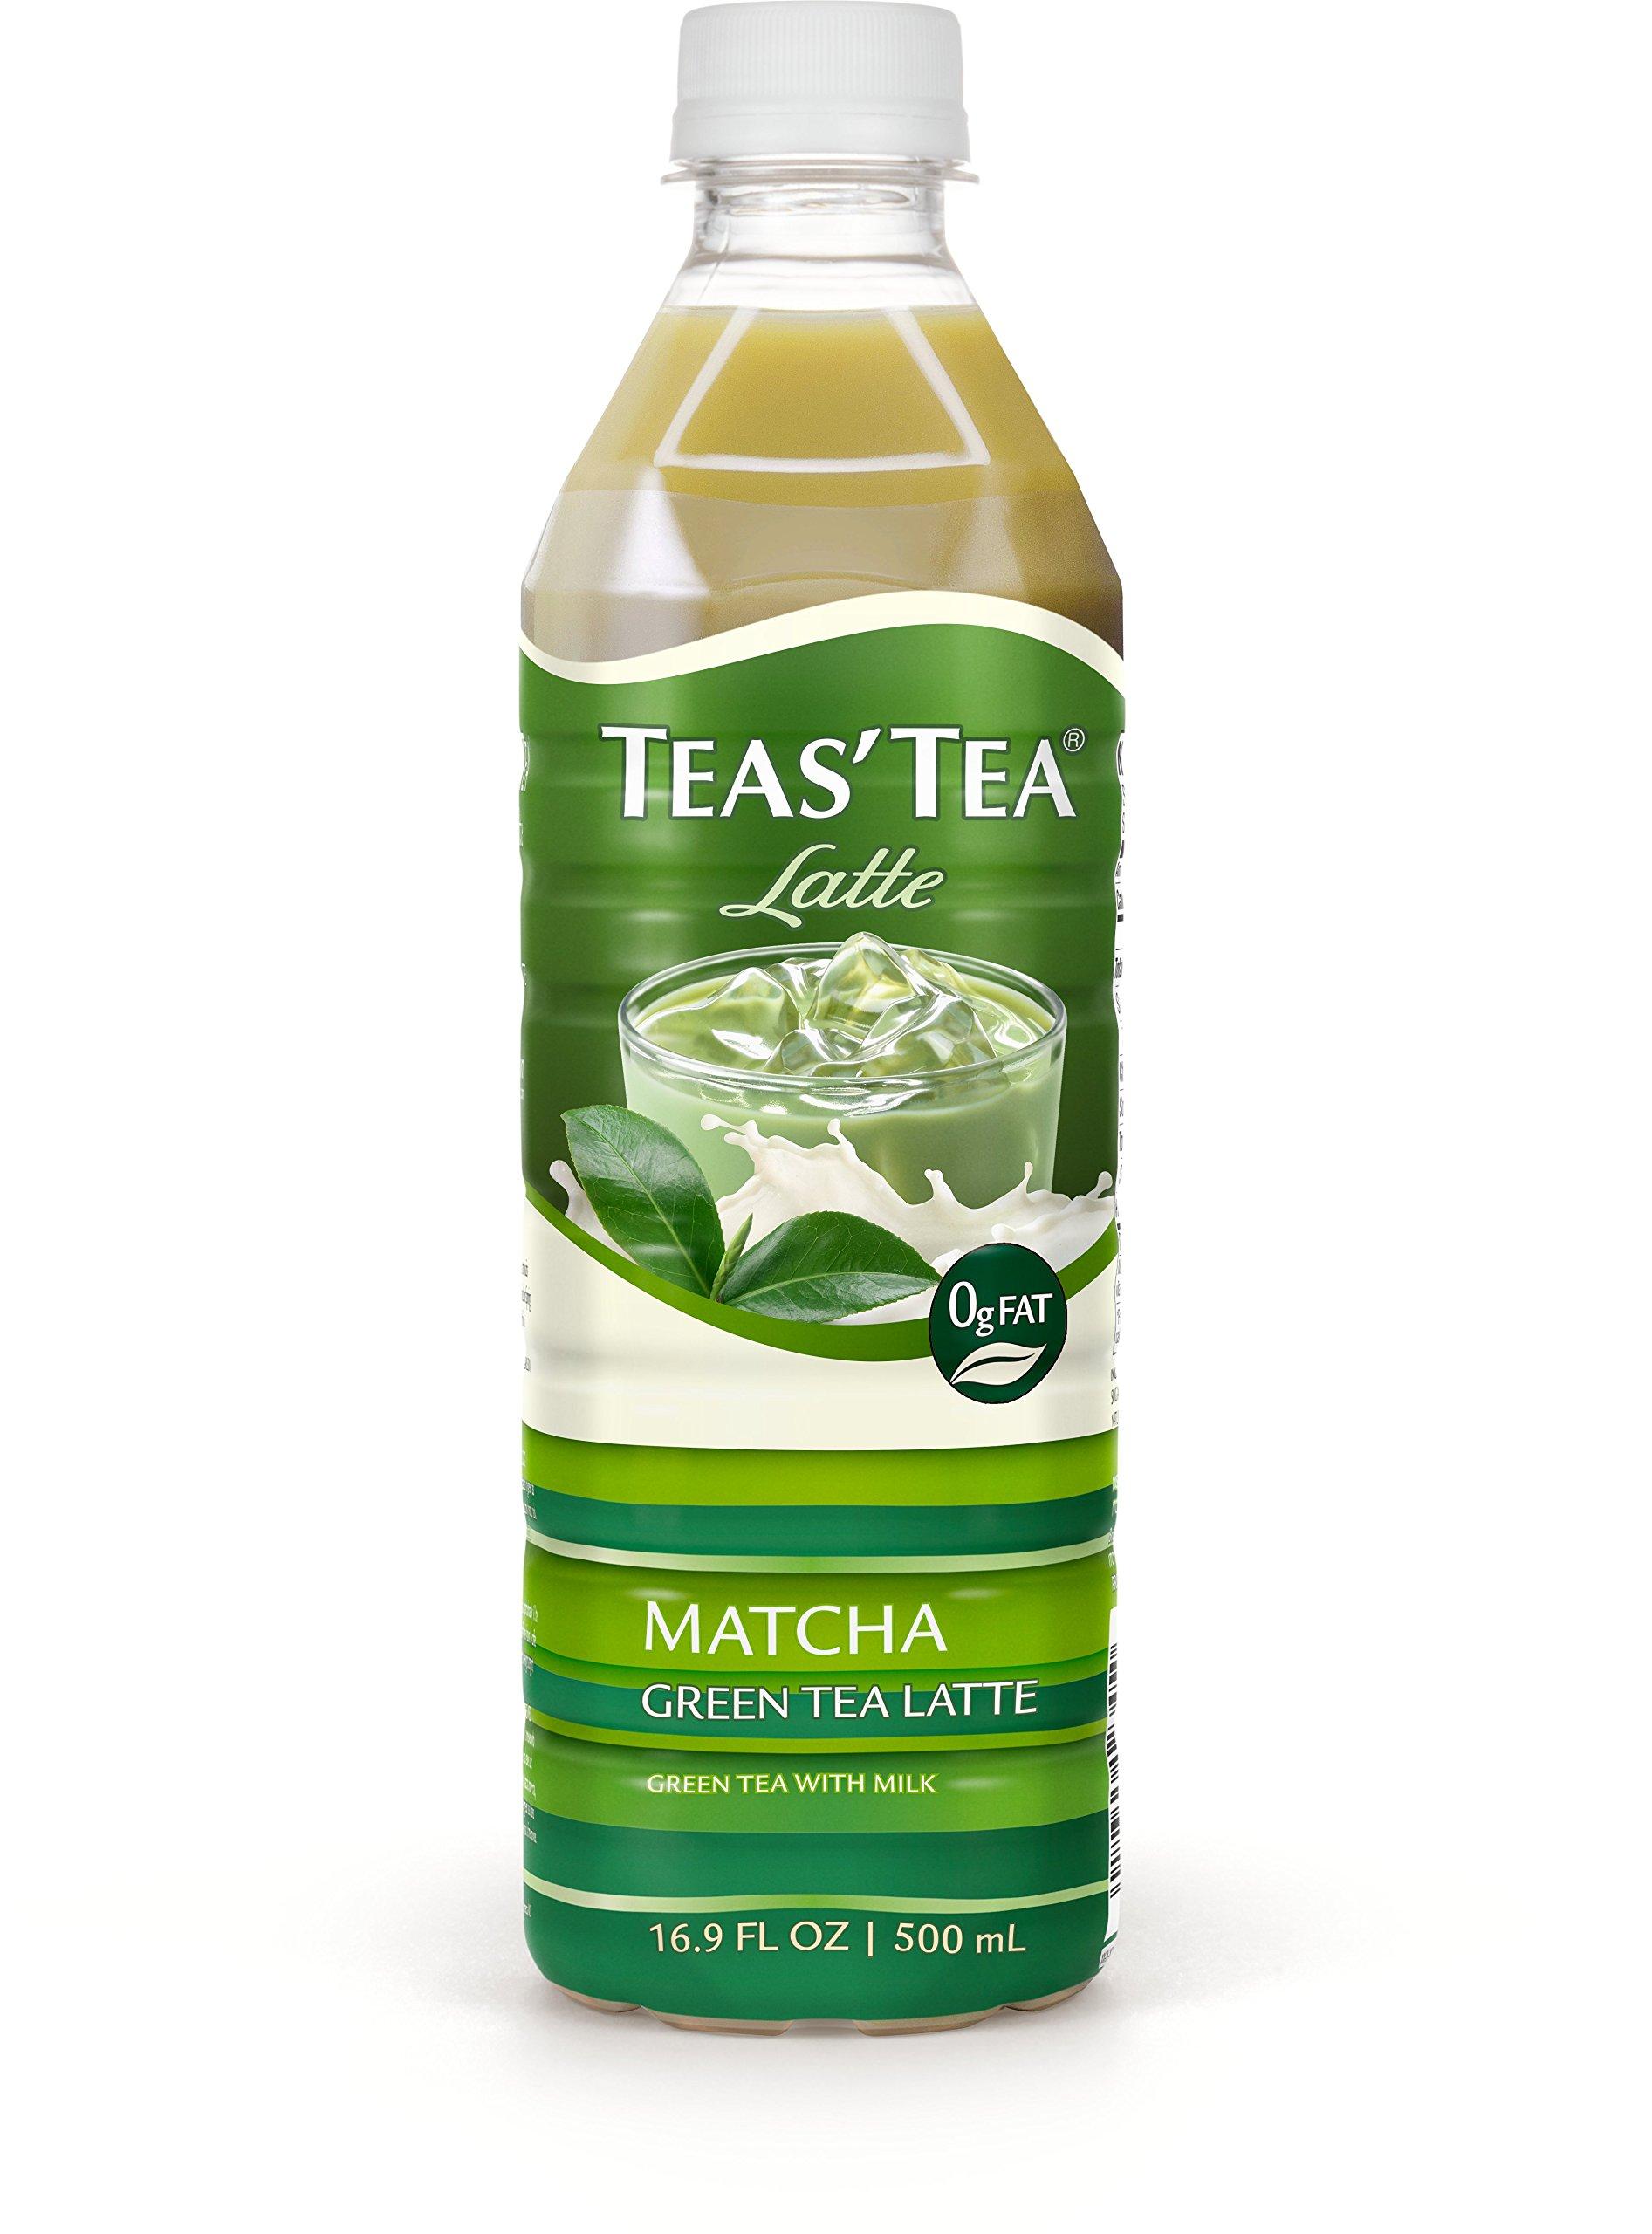 Teas' Tea Matcha Green Tea Latte, 16.9 Ounce (Pack of 12), Organic, Cane Sugar Sweetened, Fat Free, No Artificial Sweeteners, Antioxidant Rich, High in Vitamin C, Caffeinated